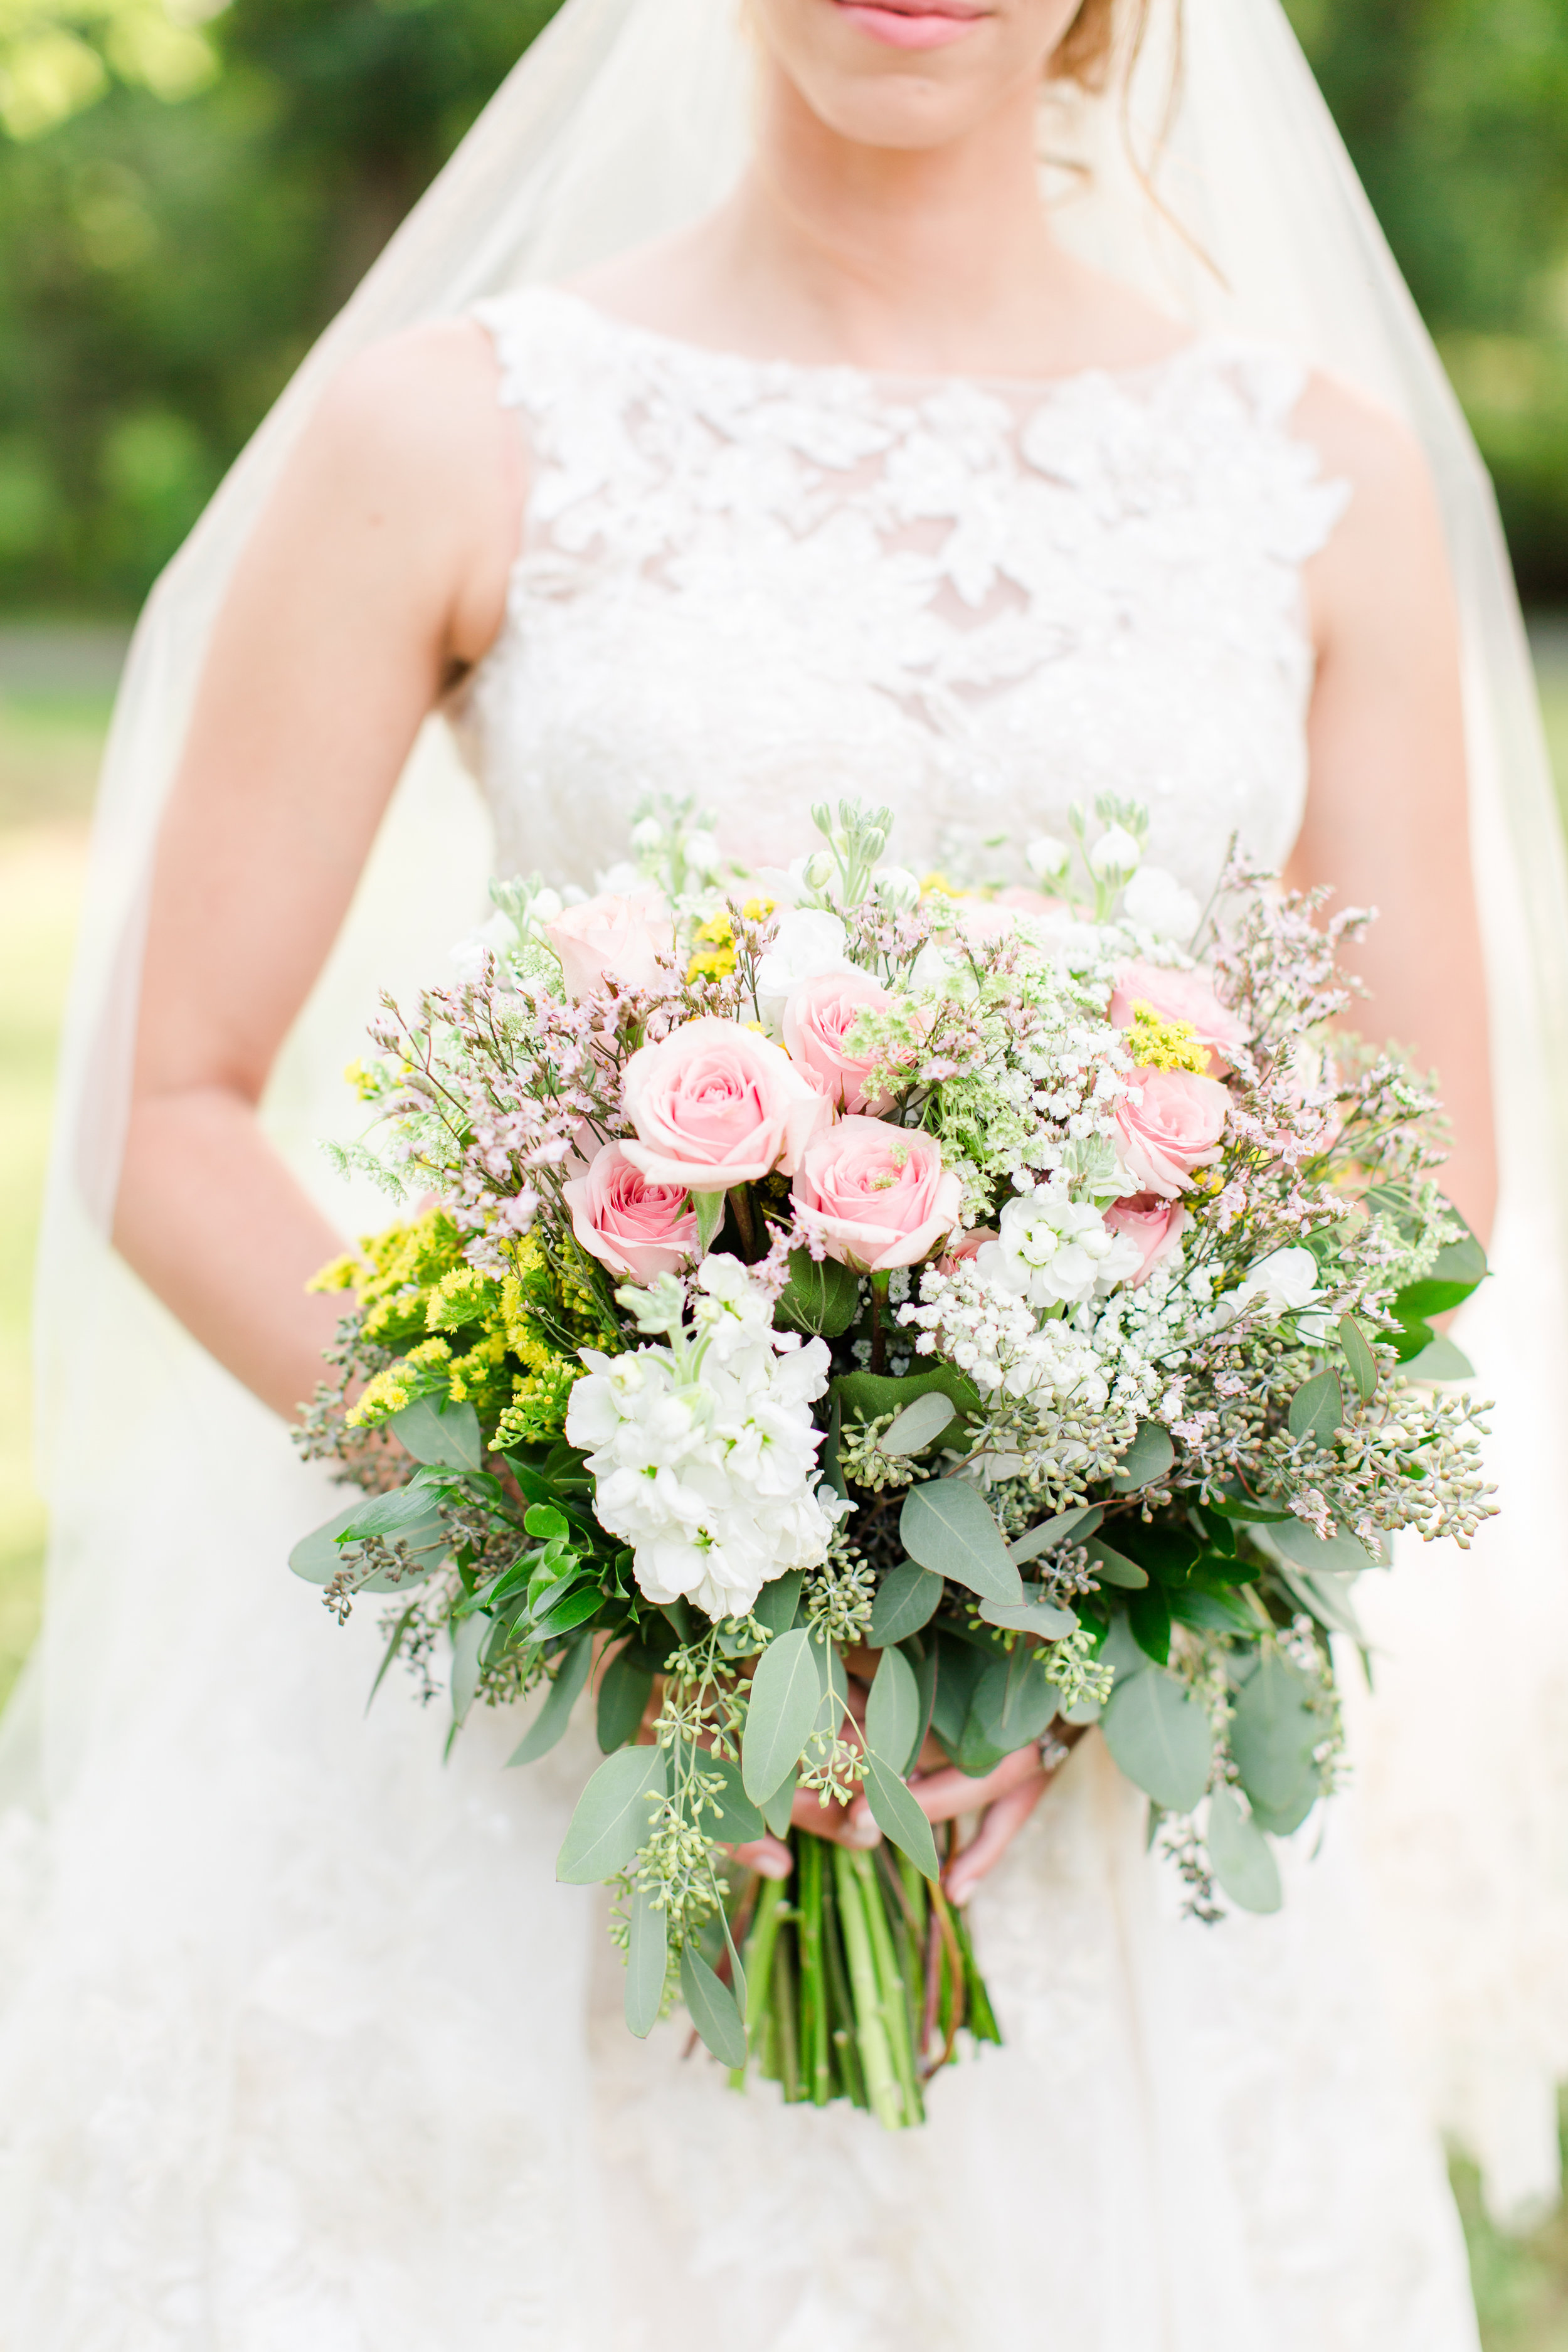 Gorgeous Wedding Bouquets - West Virginia Wedding Photographer - Wedding Venue